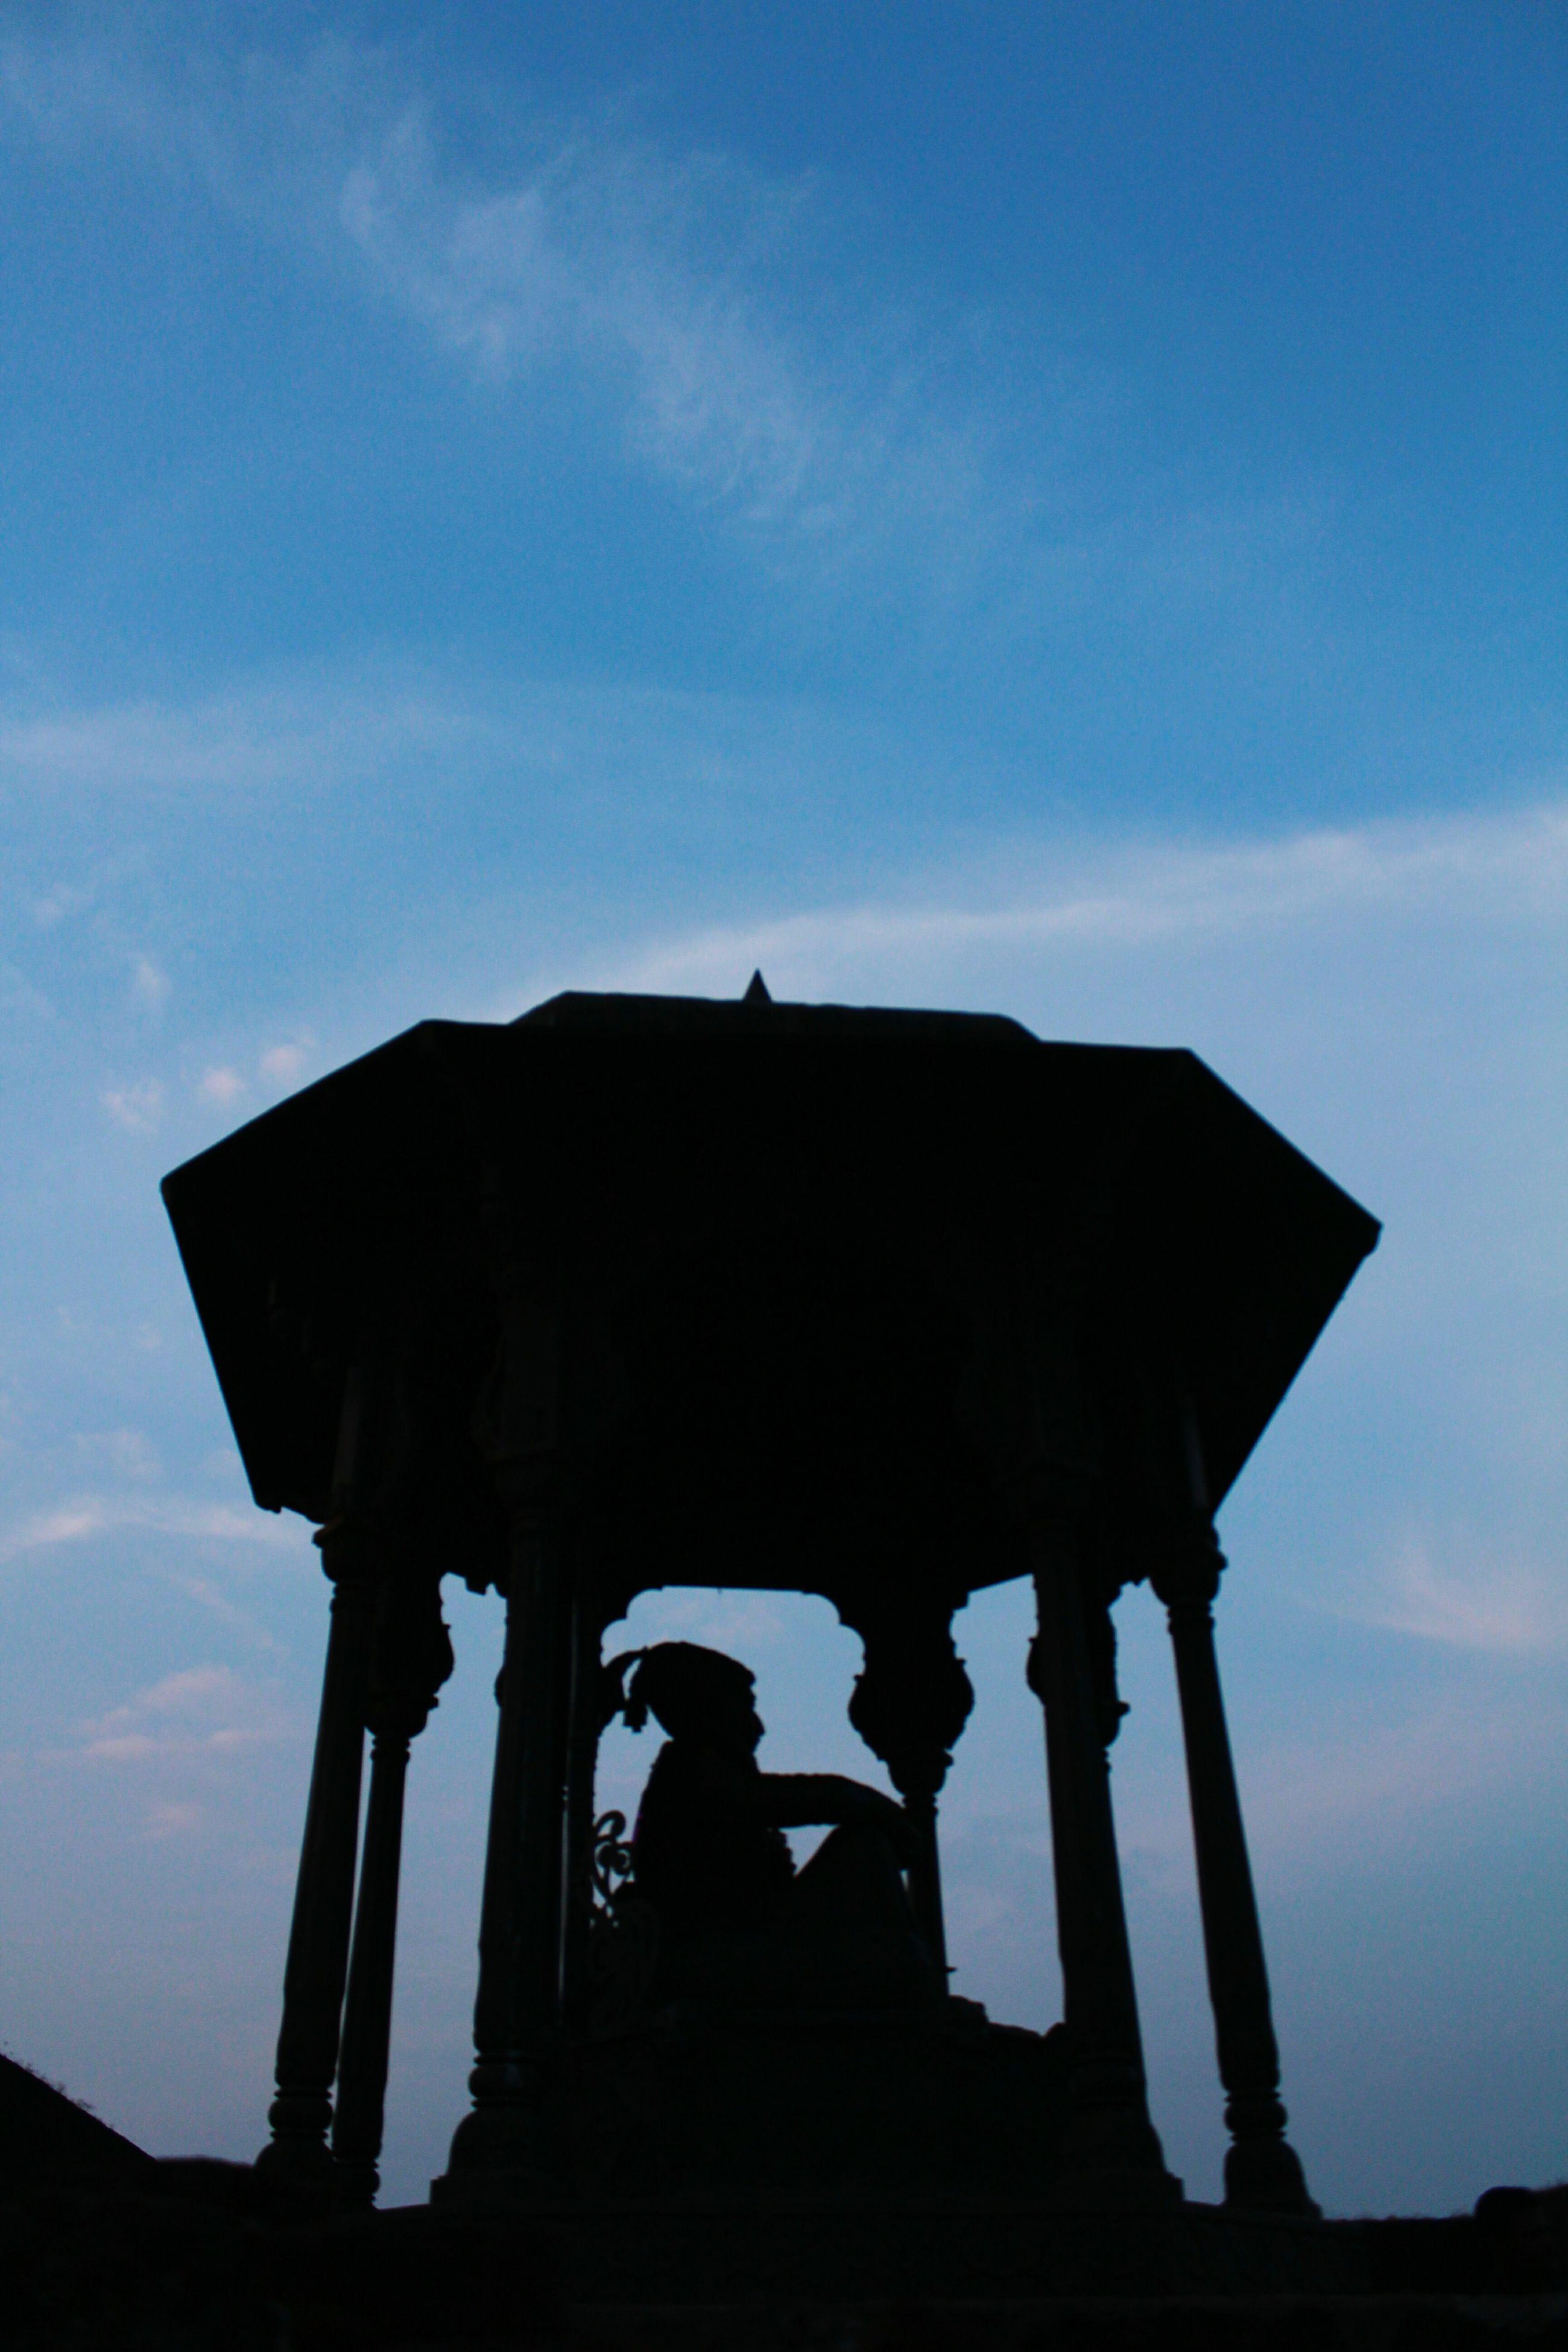 sky, silhouette, low angle view, architecture, built structure, cloud - sky, history, cloud, sunset, spirituality, religion, dusk, building exterior, architectural column, sculpture, statue, place of worship, famous place, outdoors, travel destinations